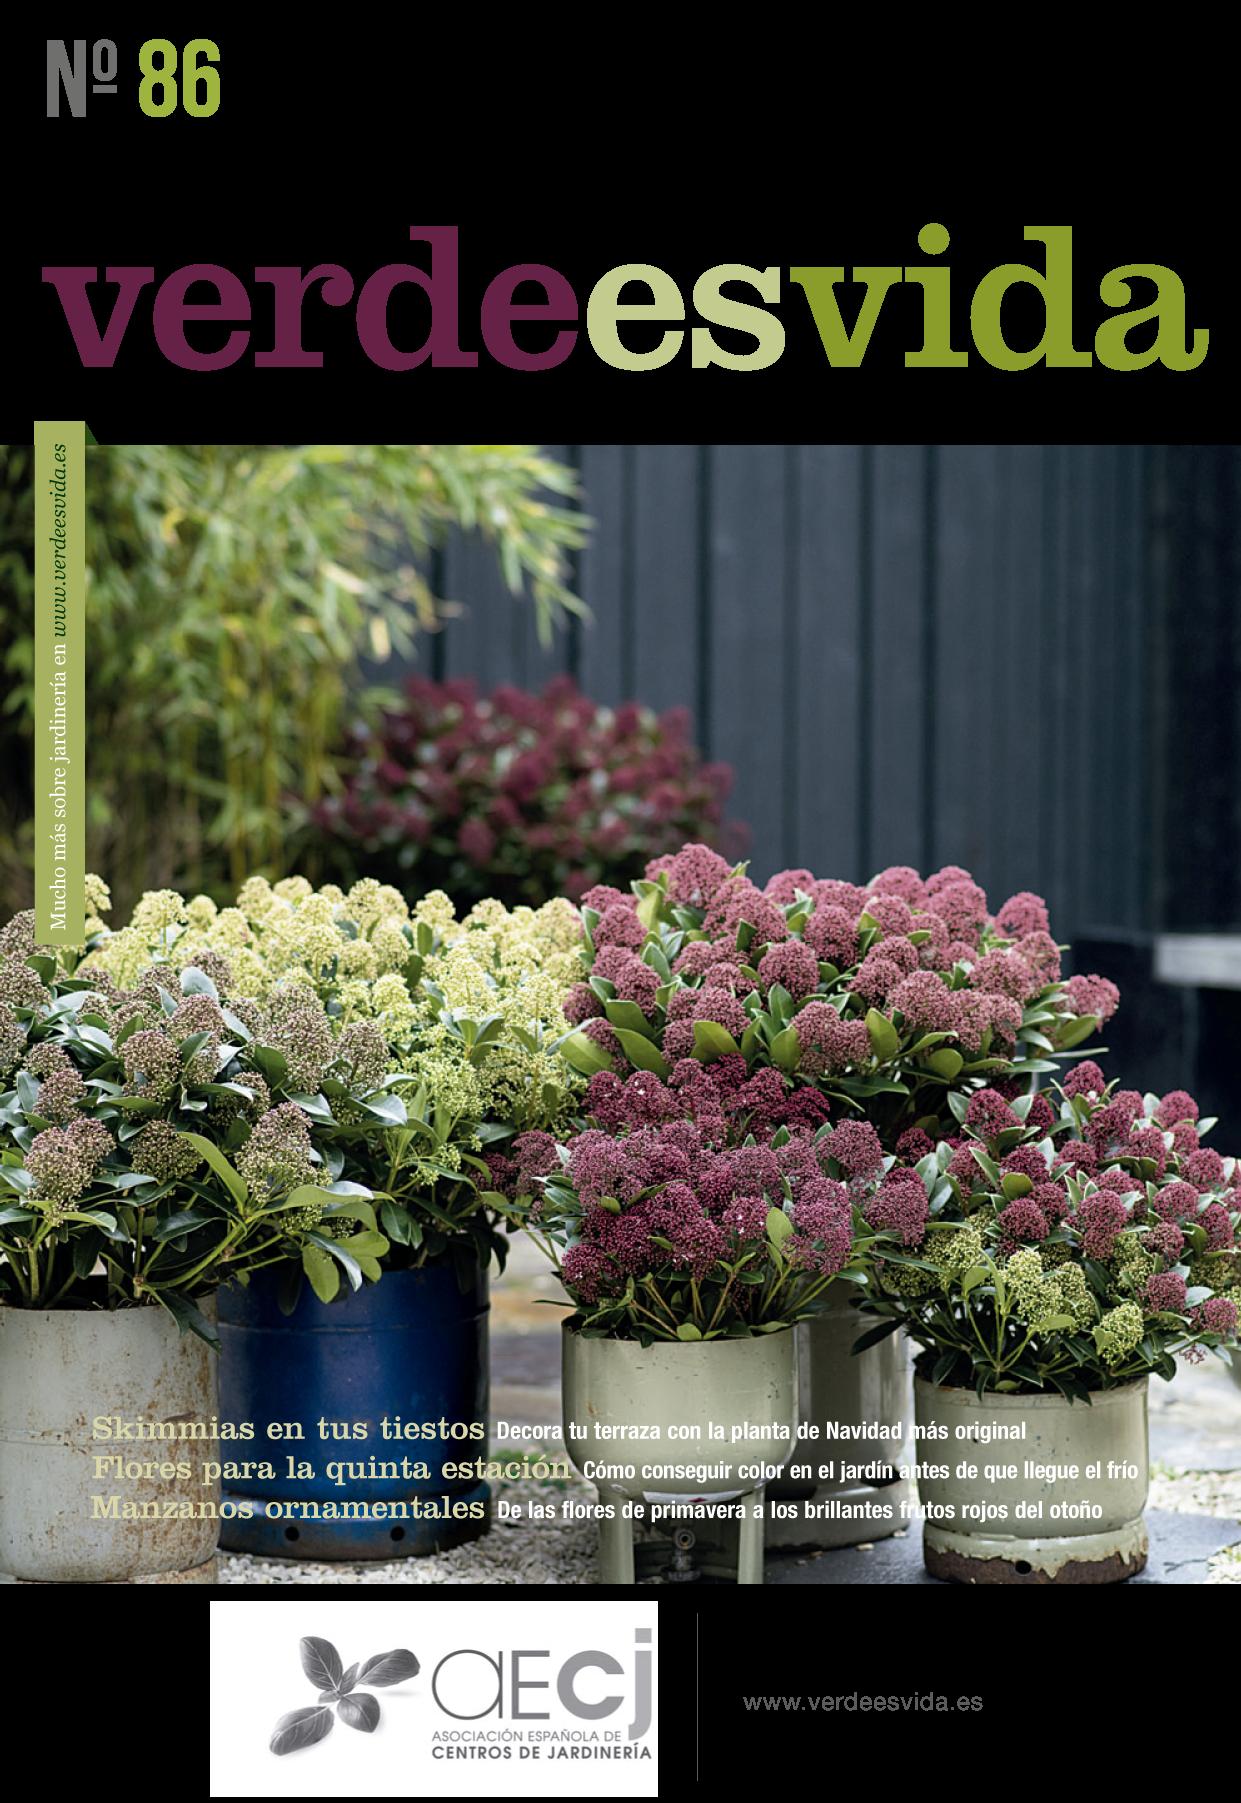 Revista verdeesvida nº 86.pngRevista verdeesvida nº 86